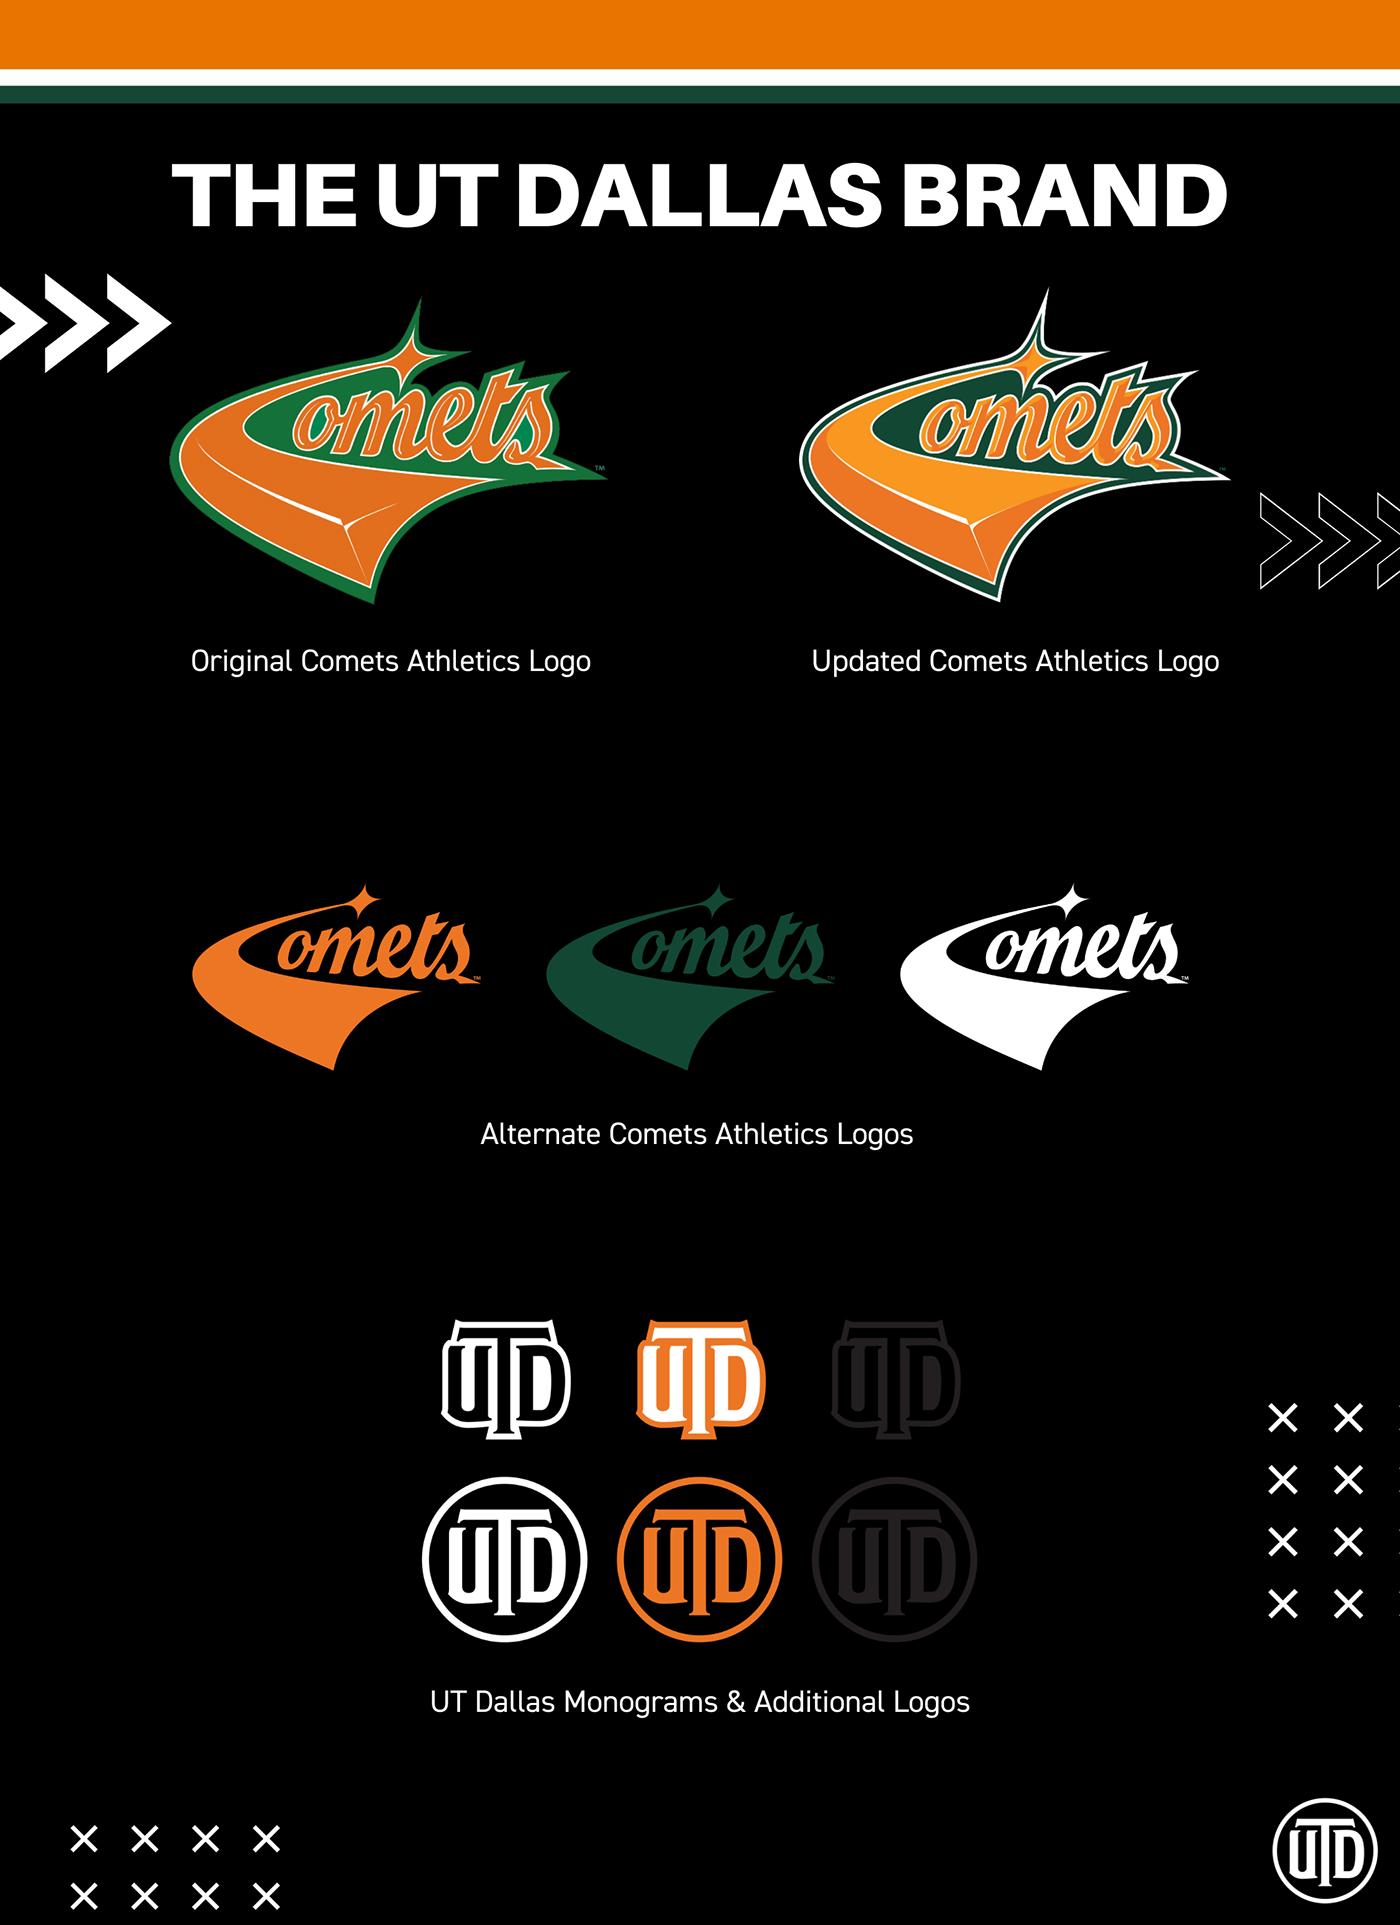 esports esports brand Esports Rebrand UTDallas utdesports